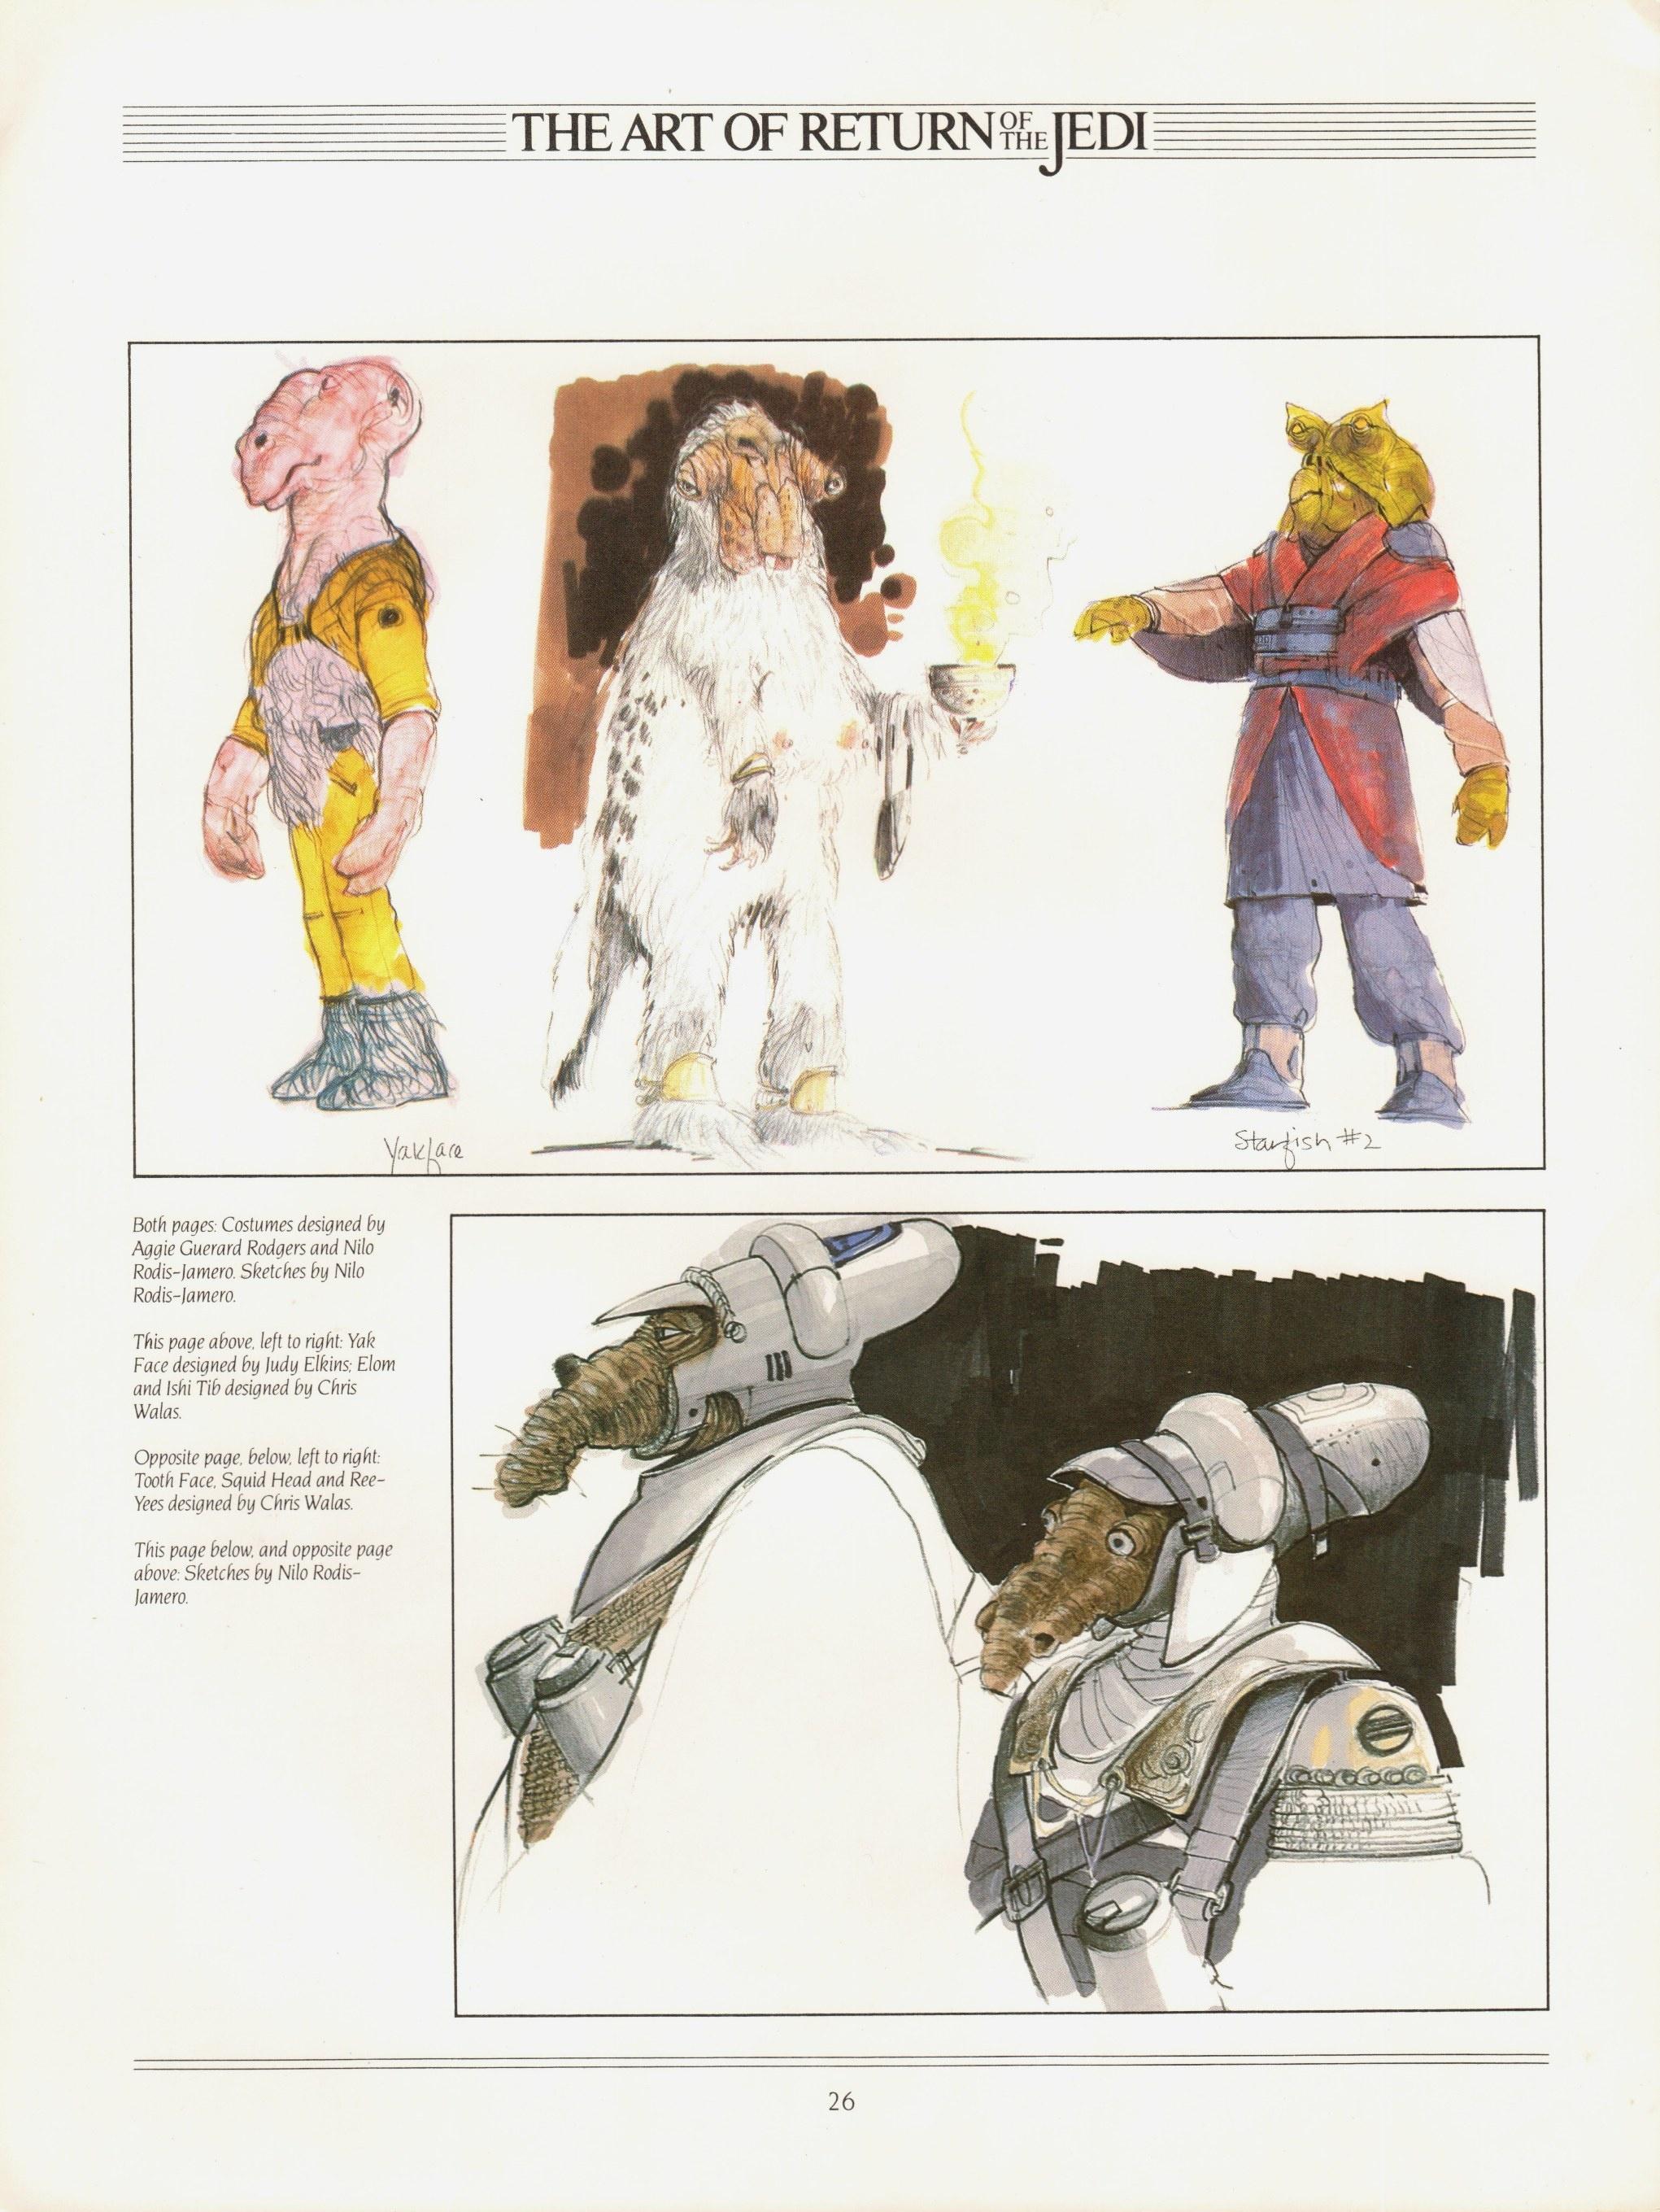 Art of Return of the Jedi (b0bafett_Empire)-p026